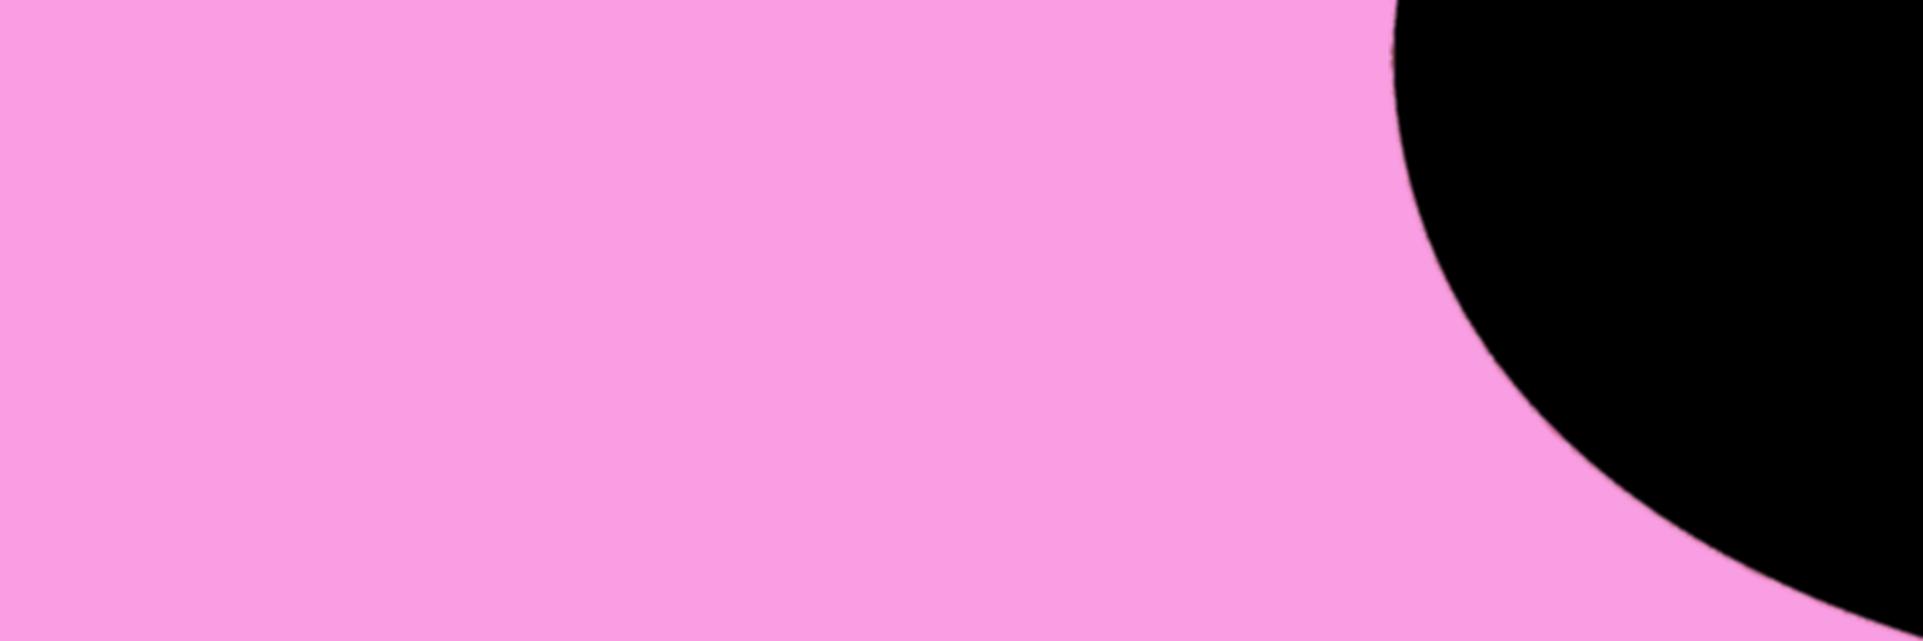 Pink Border.png